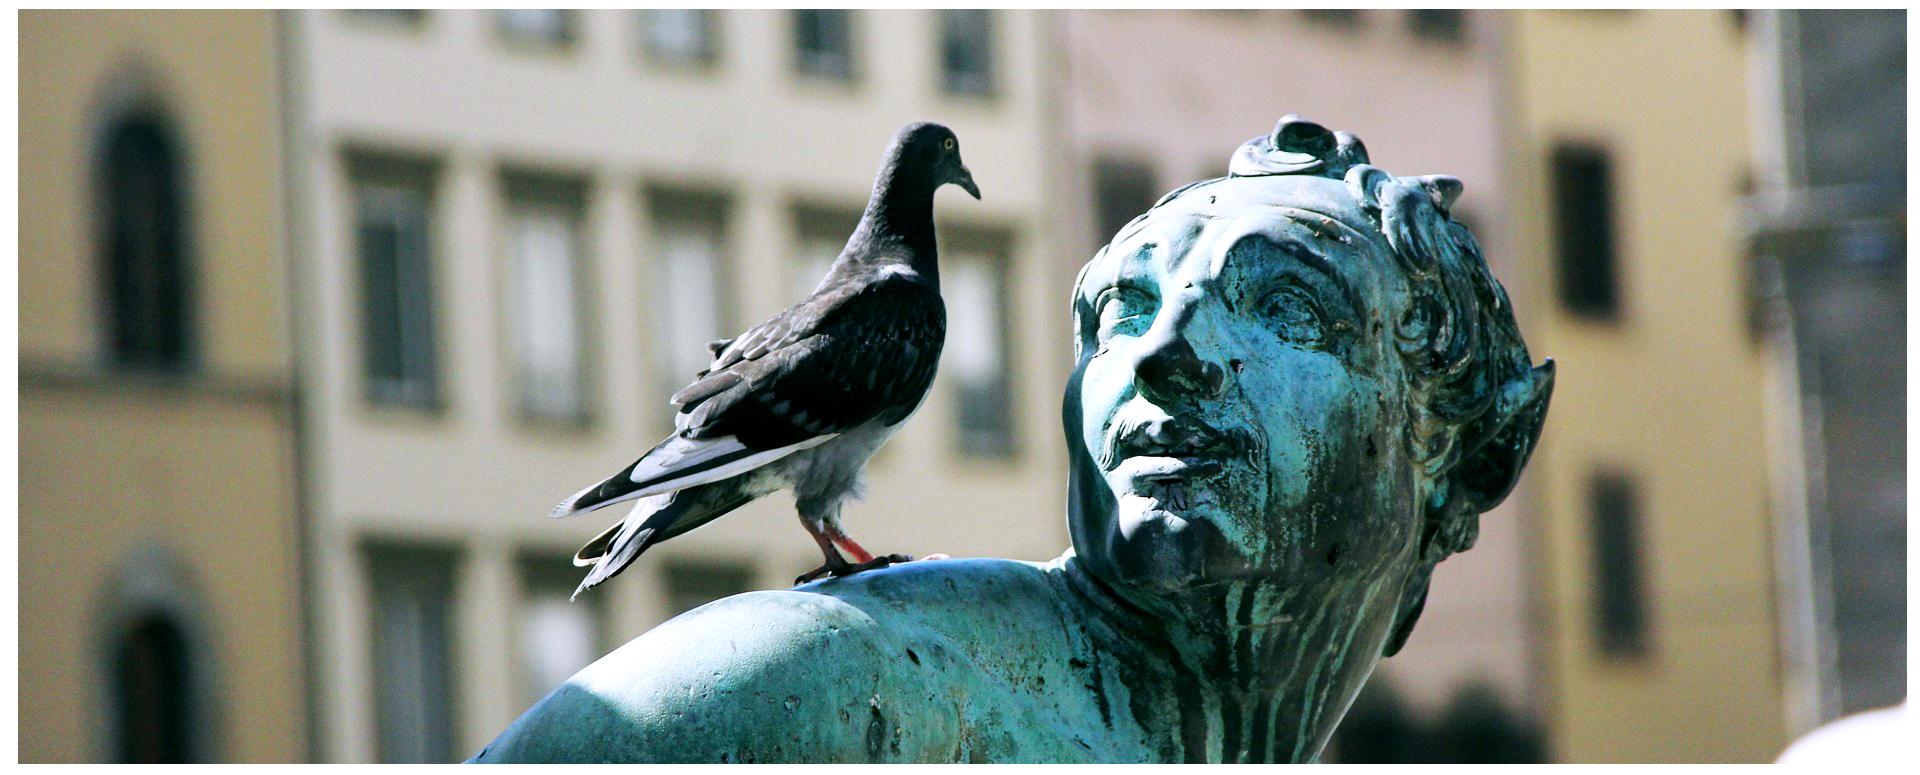 statue-185435_1920_2.jpg